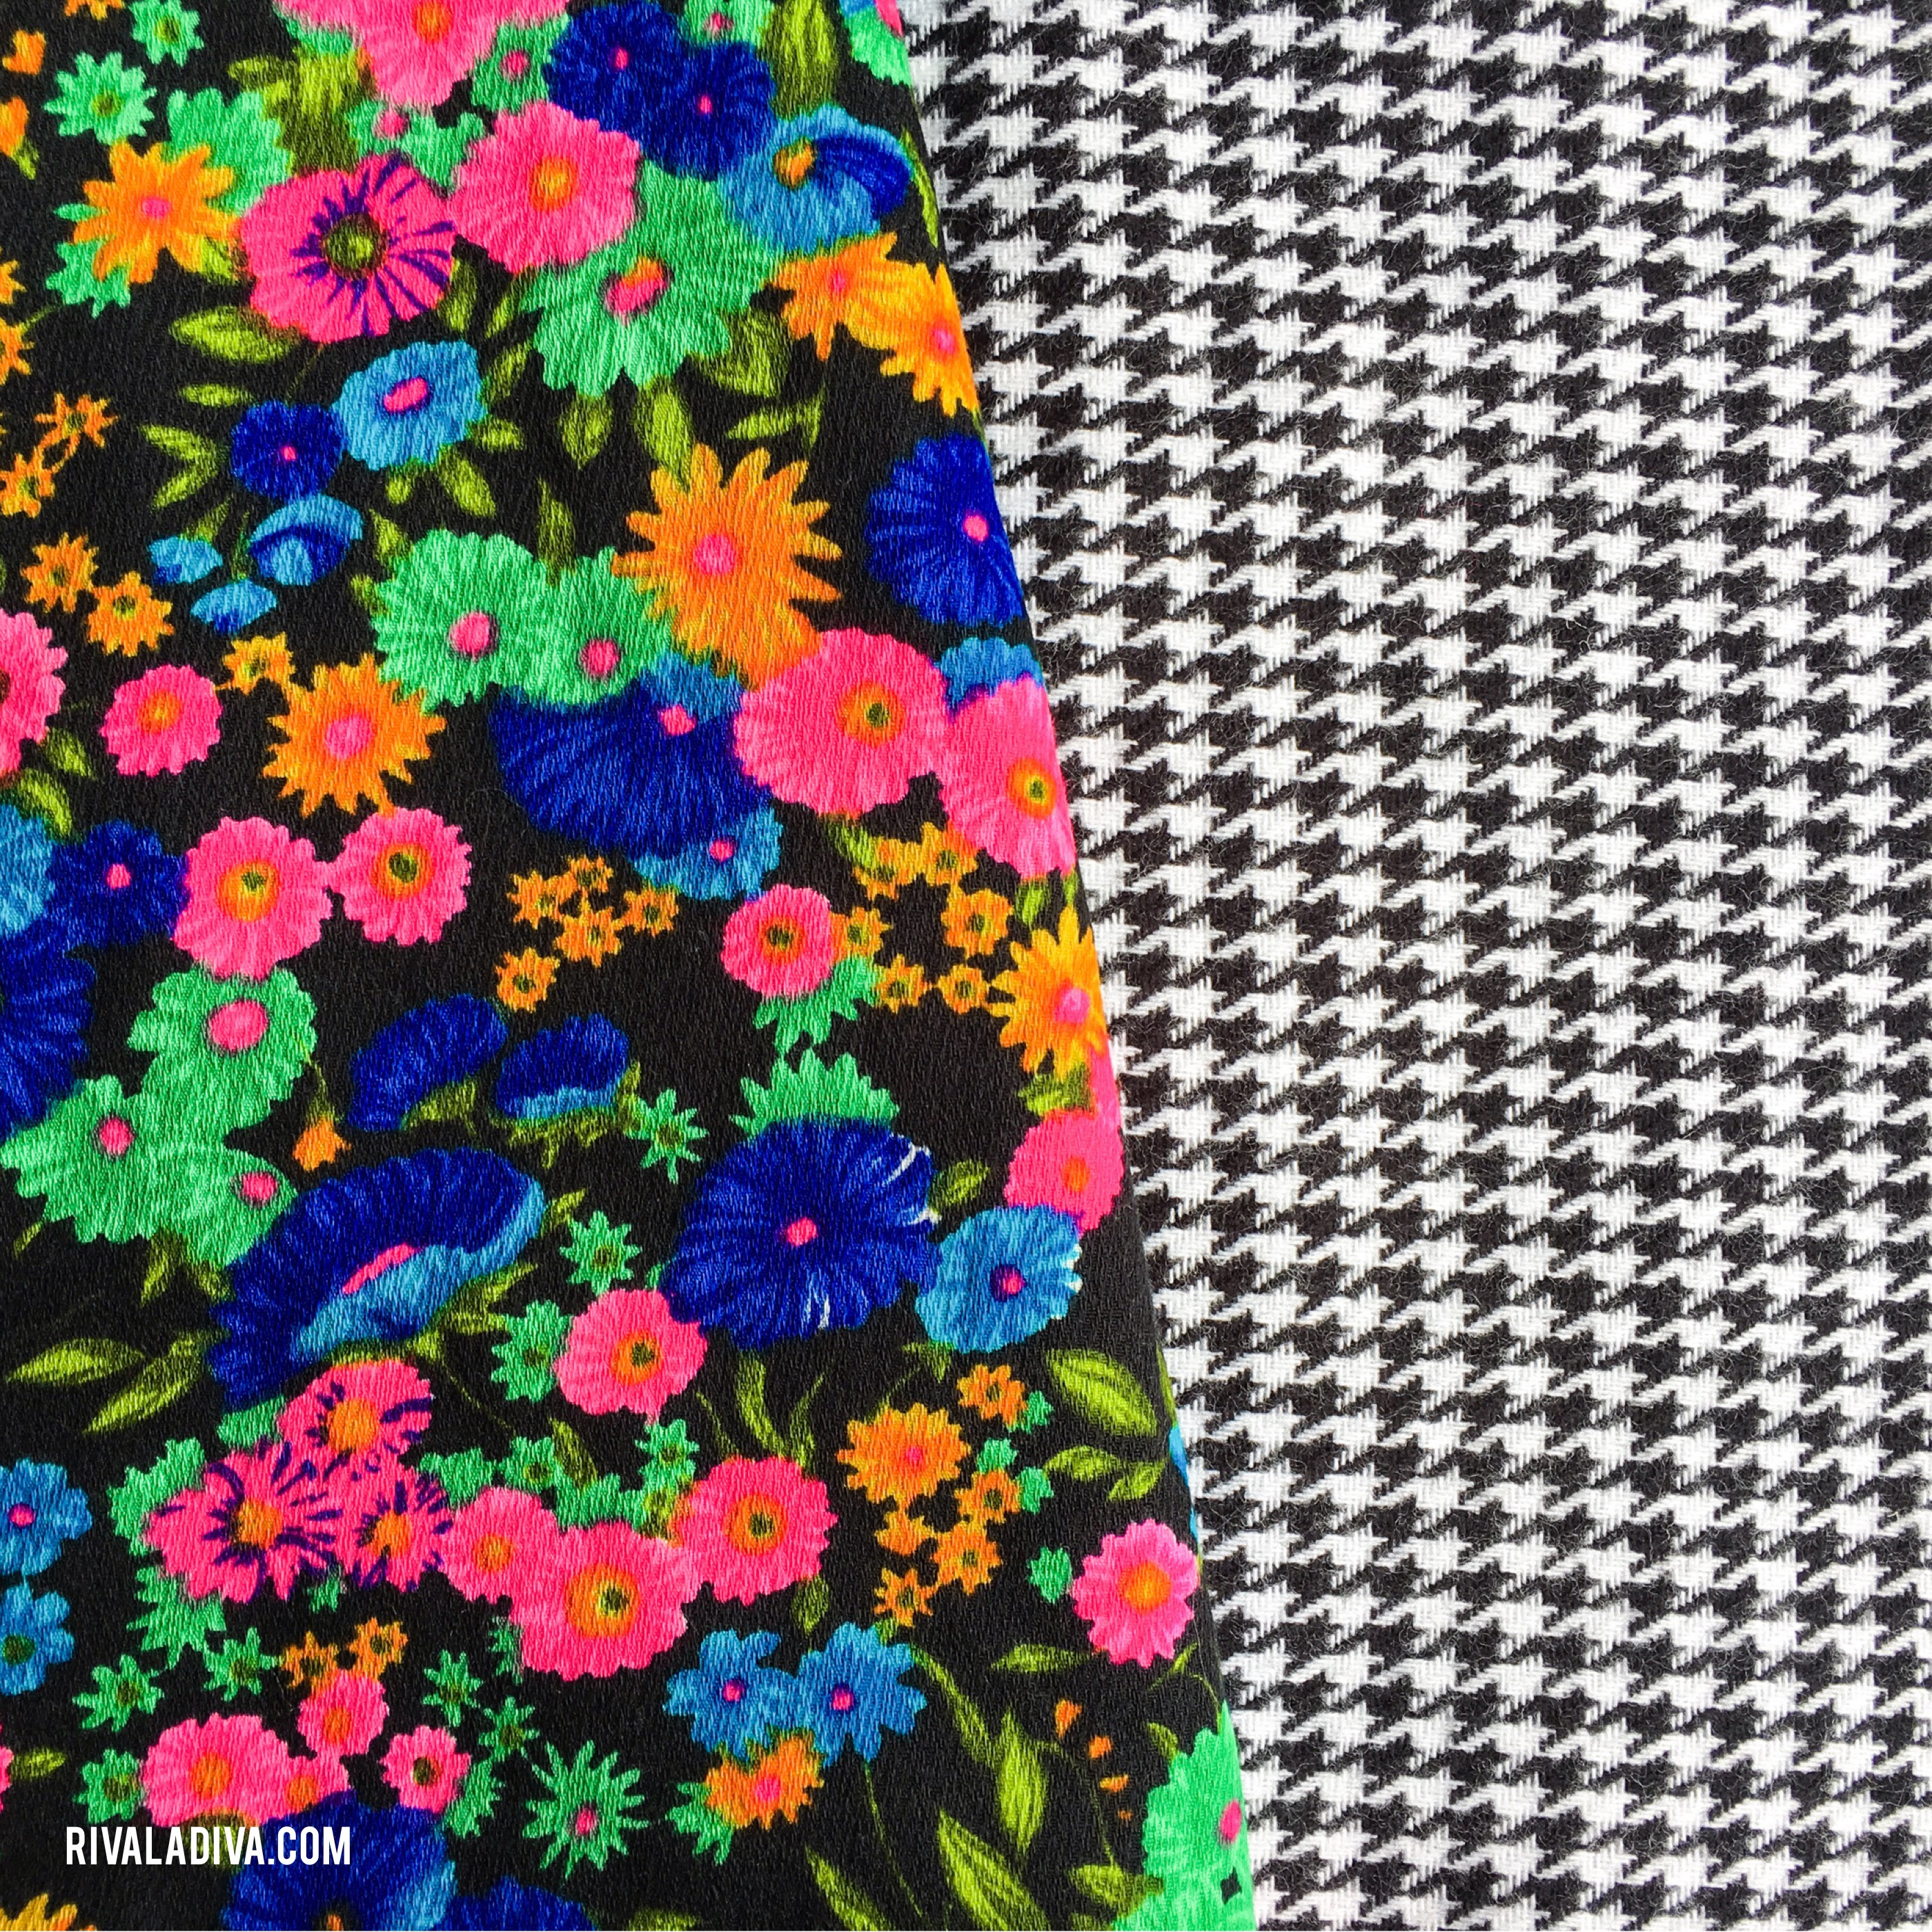 Print Mixing 101 - Embracing Color and Prints